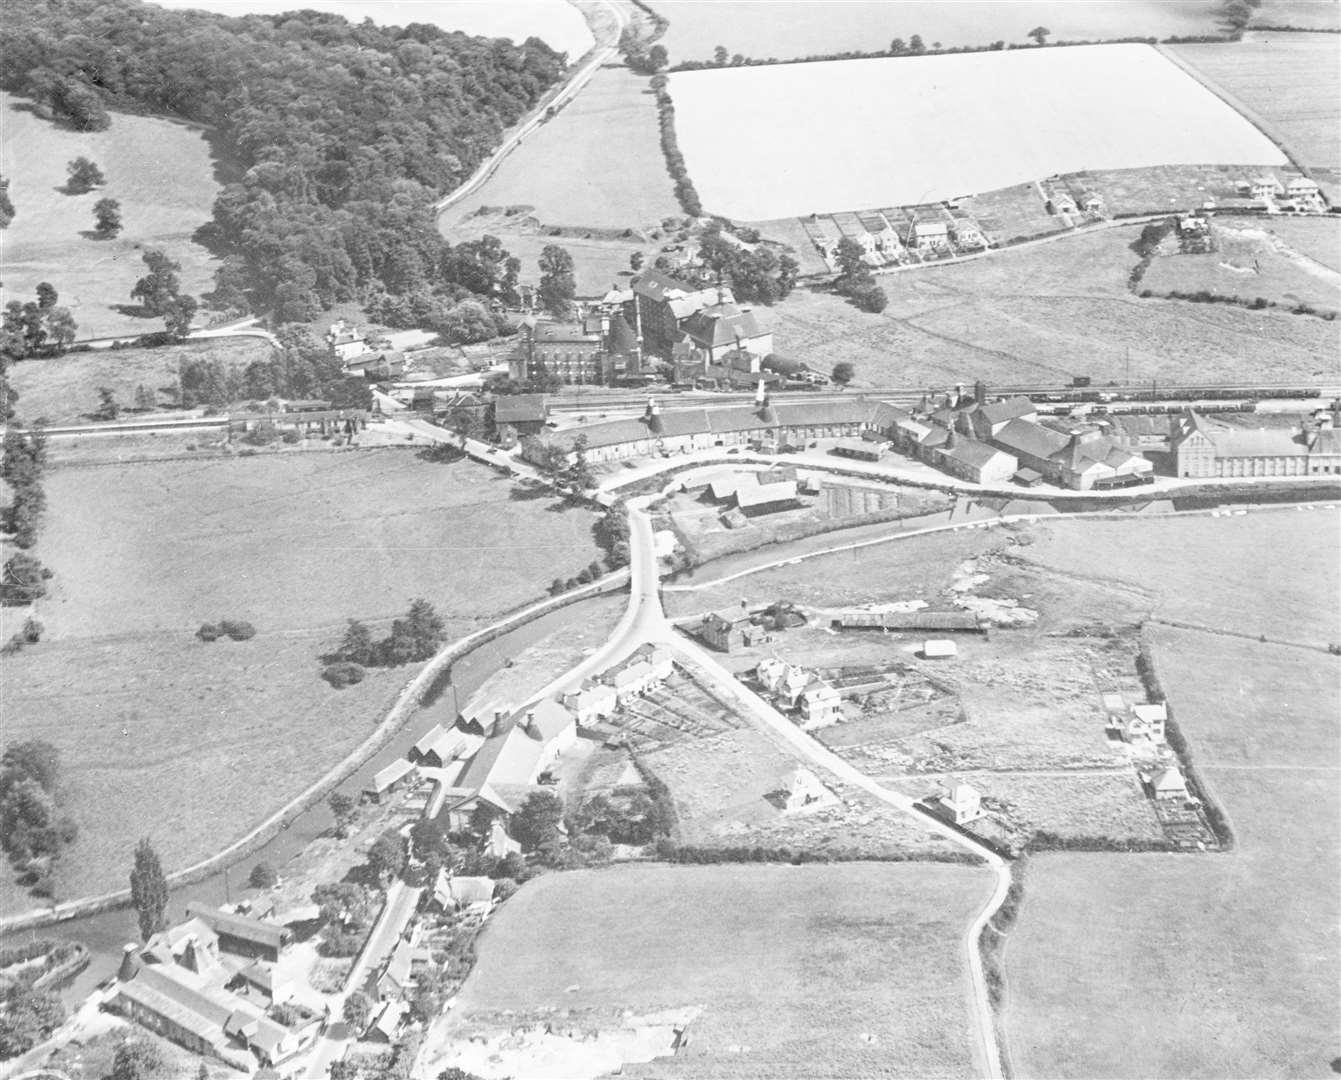 Sawbridgeworth's maltings and train station in 1929 Credit: Historic England